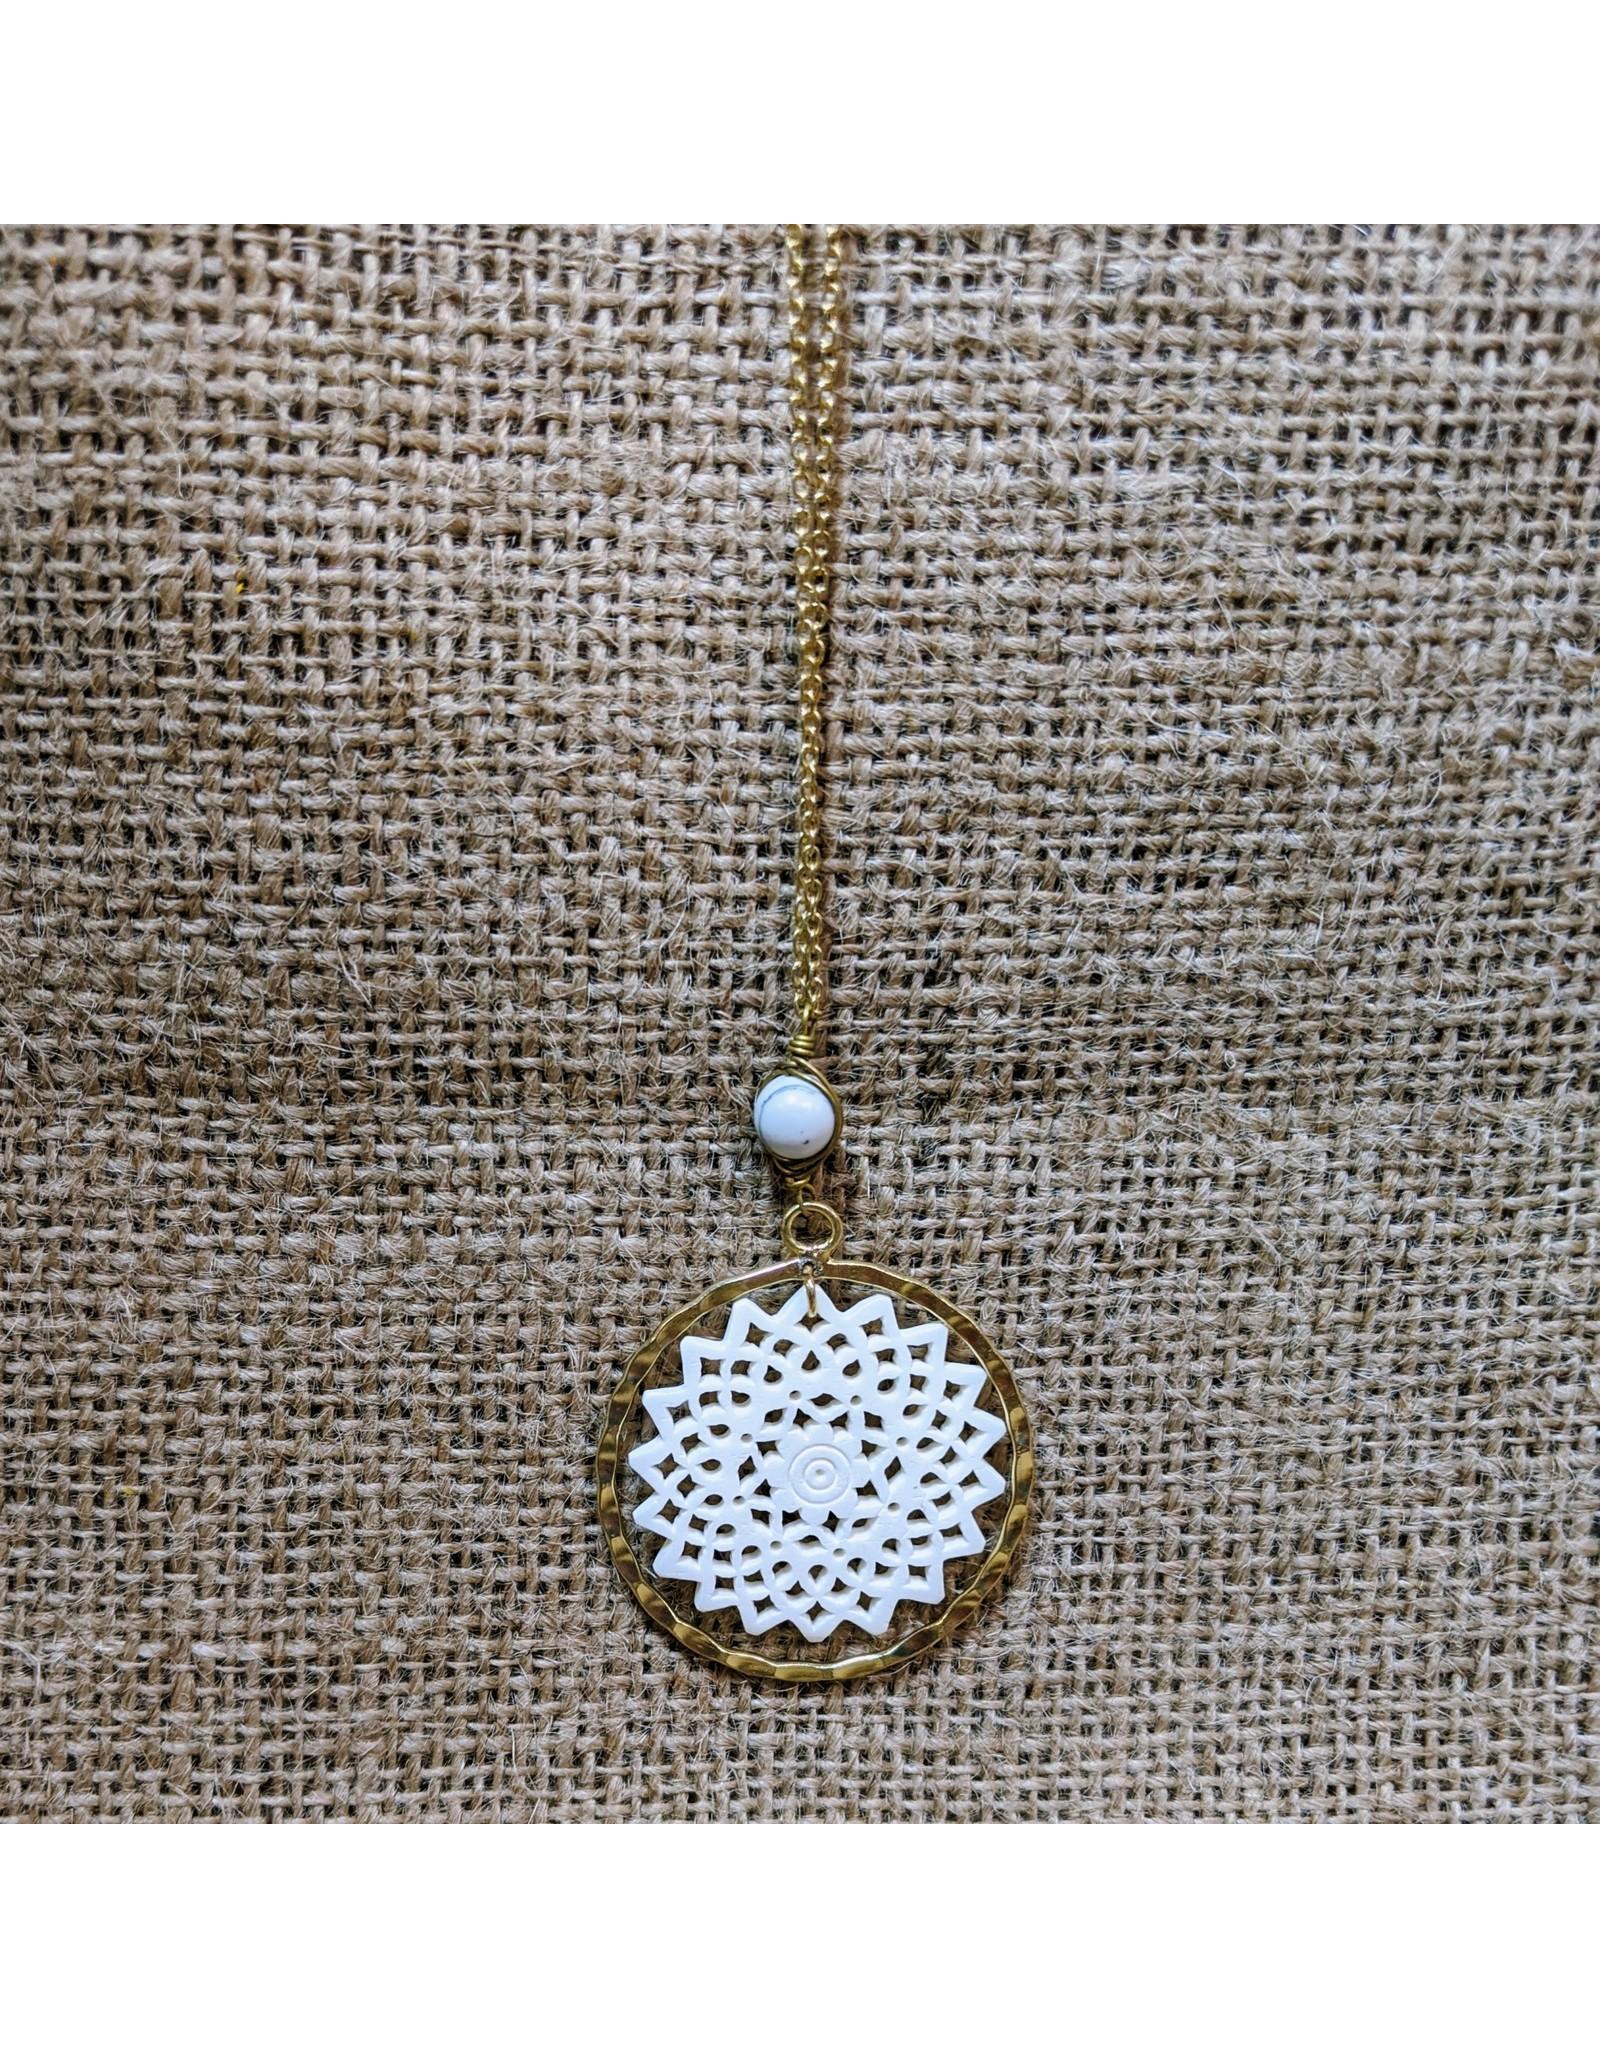 Ten Thousand Villages CLEARANCE  Bone & Brass Pendant Necklace, India